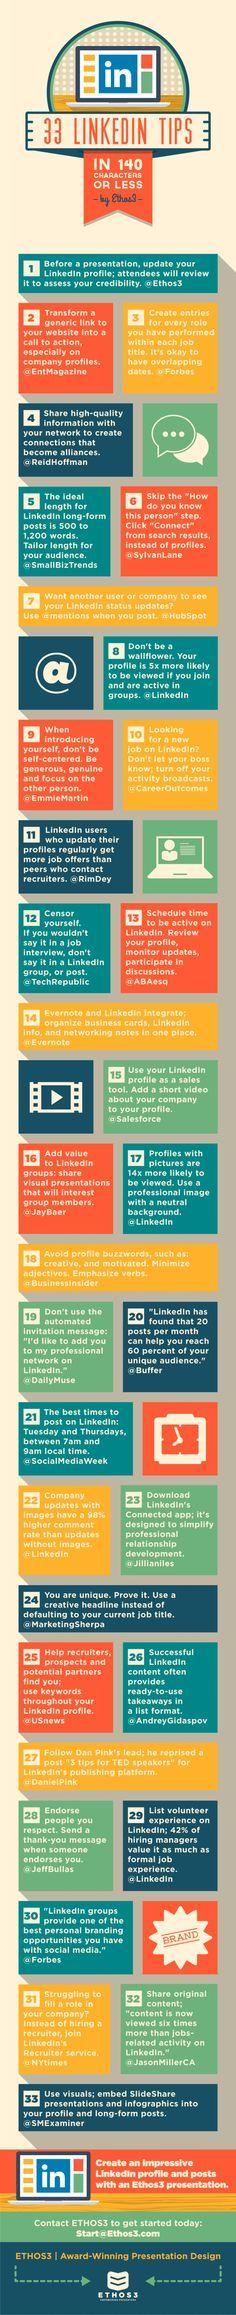 33 LinkedIn Tips In 140 Characters Or Less #LinkedIn